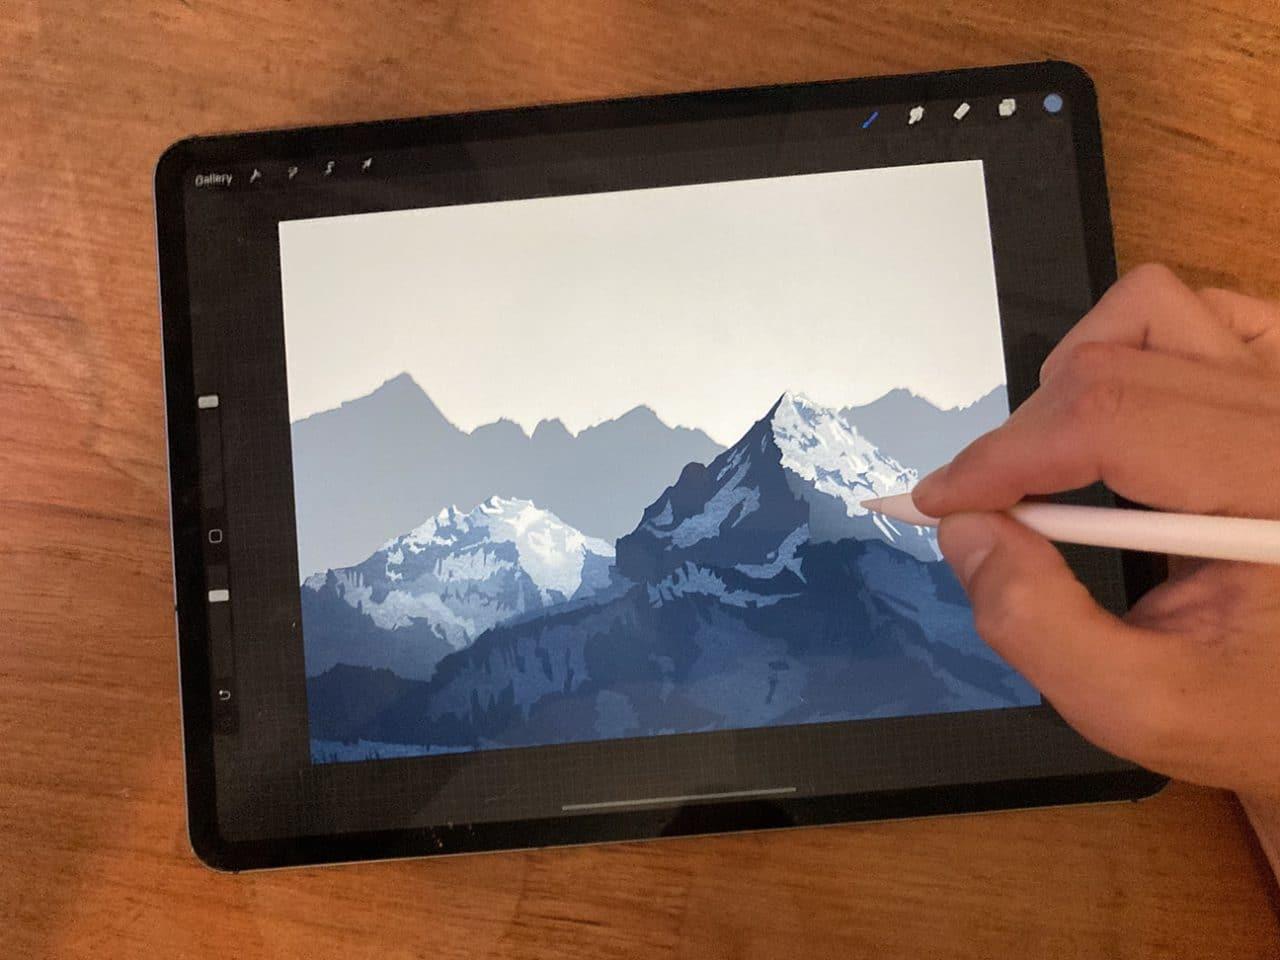 Toronto illustrator Mark Scheibmayr shares tips on how to draw mountains.